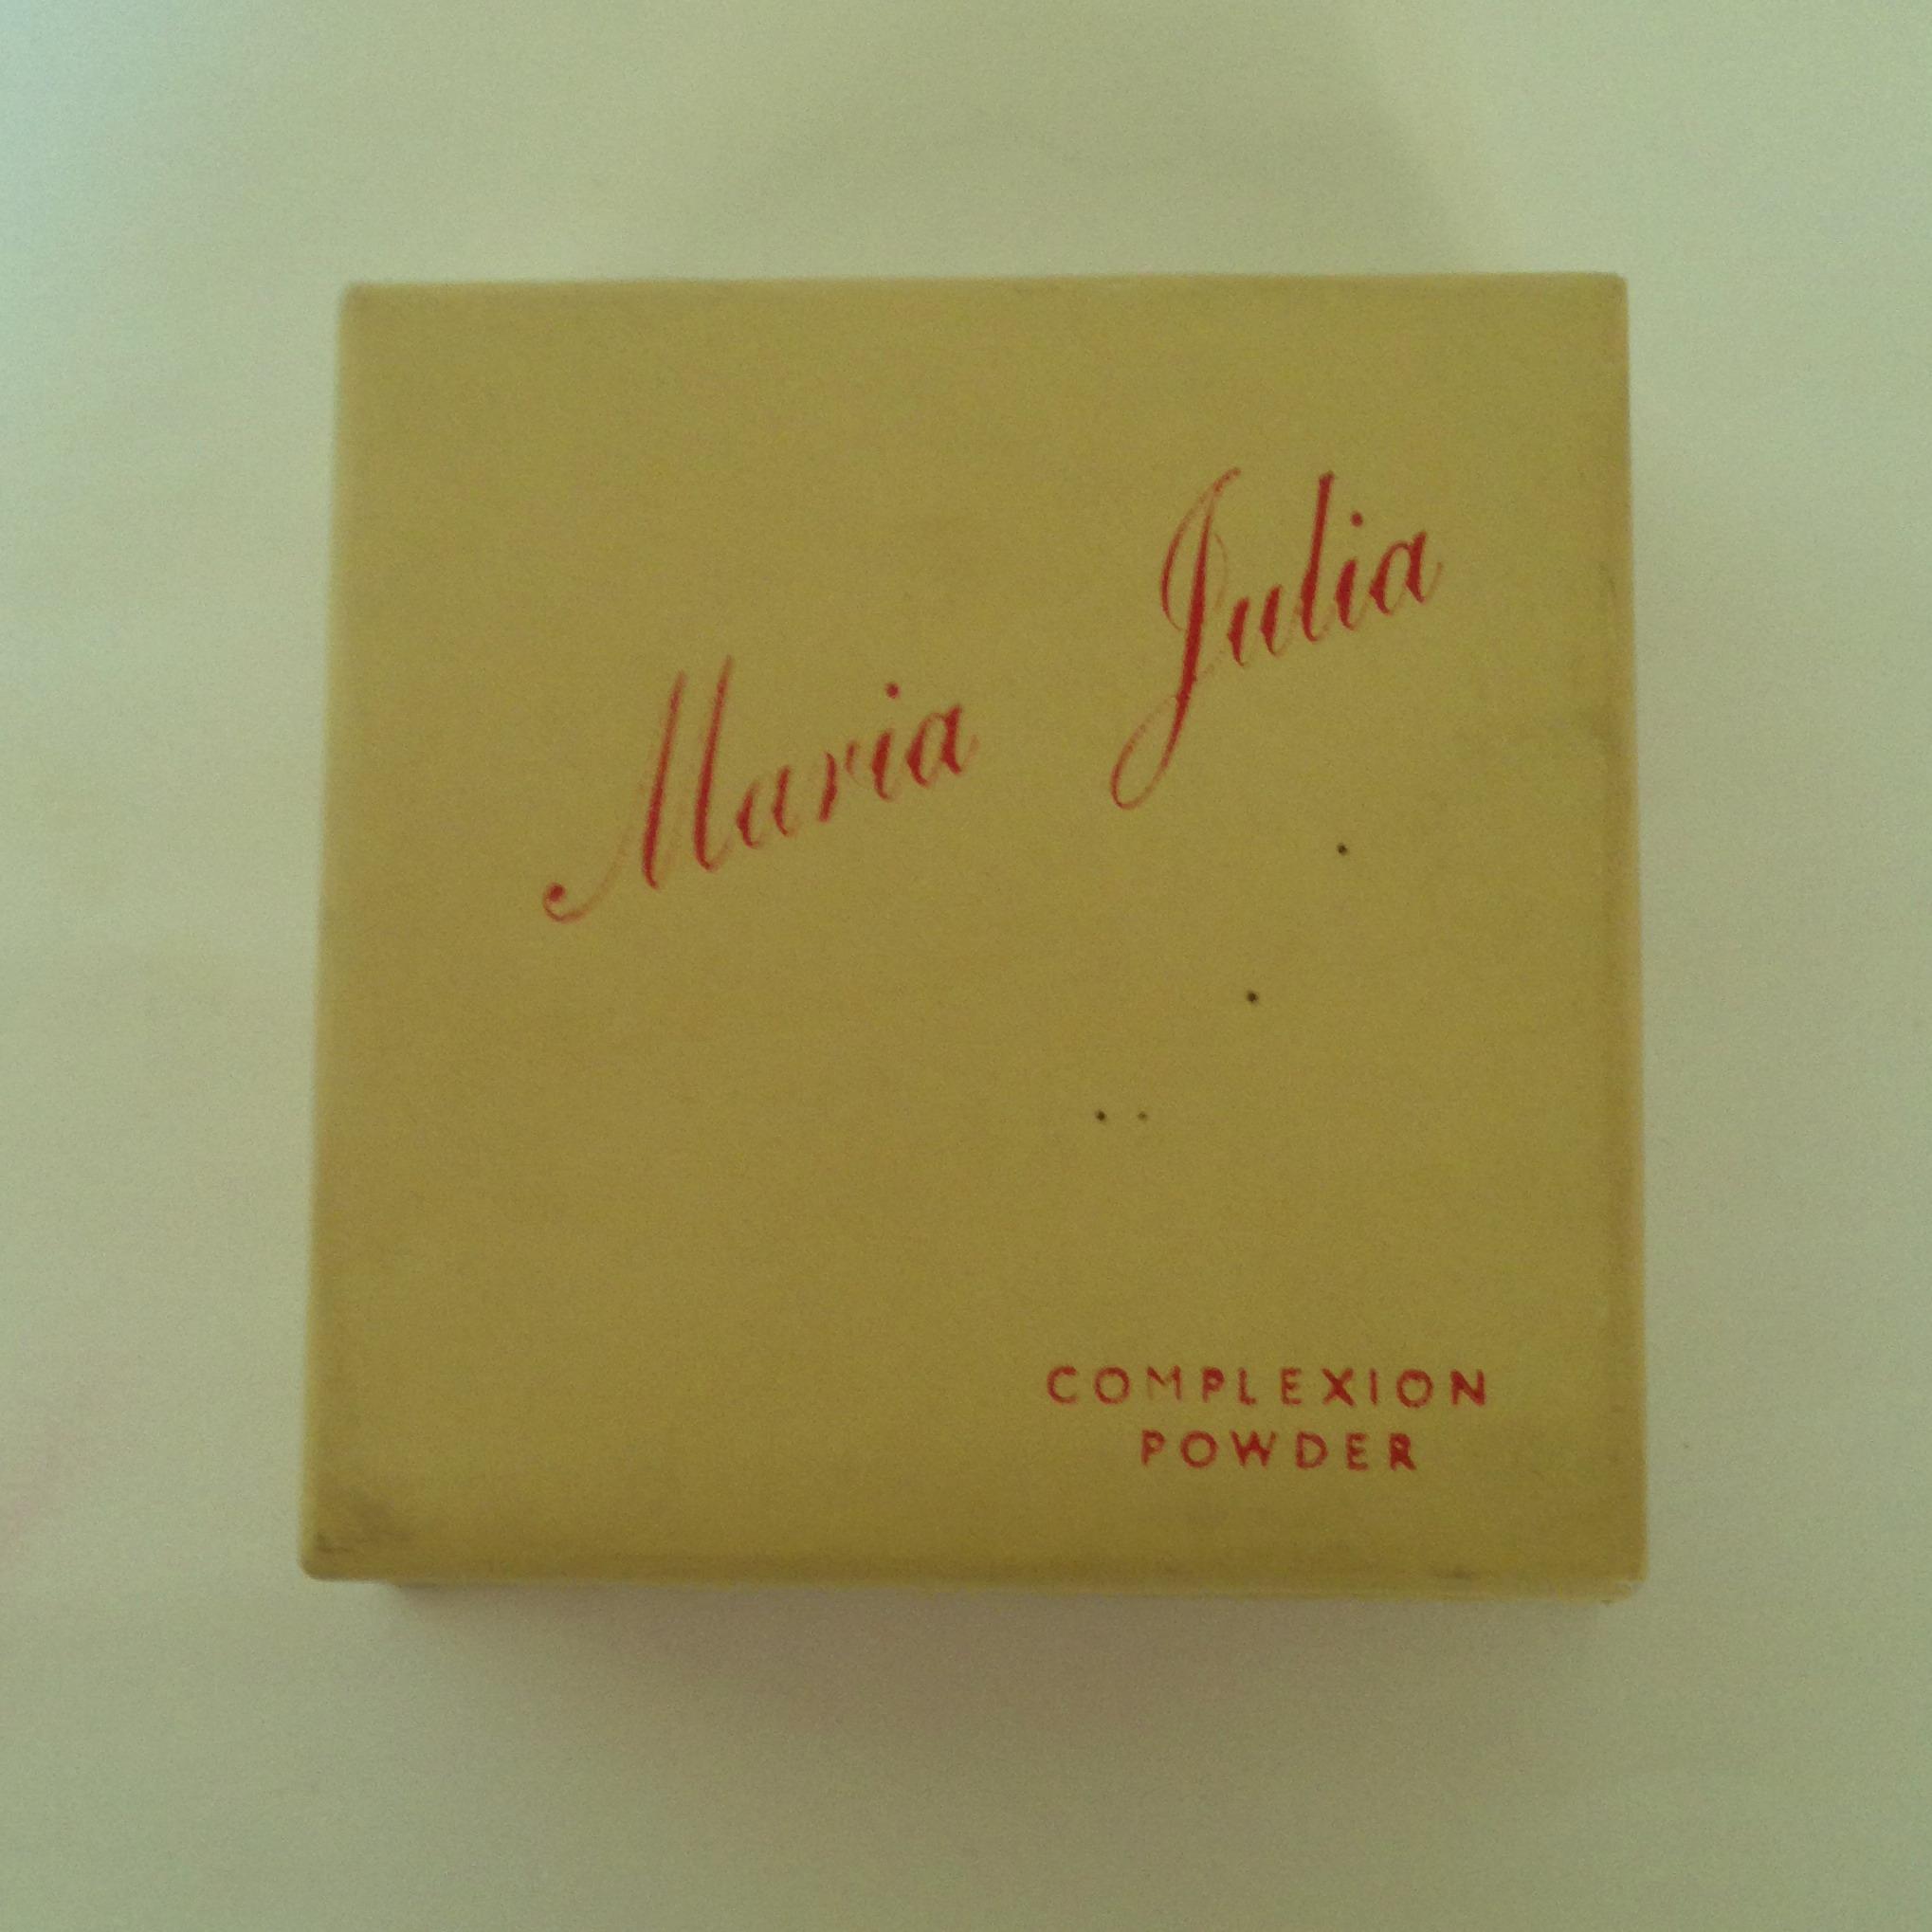 Maria Julia - Face Powder